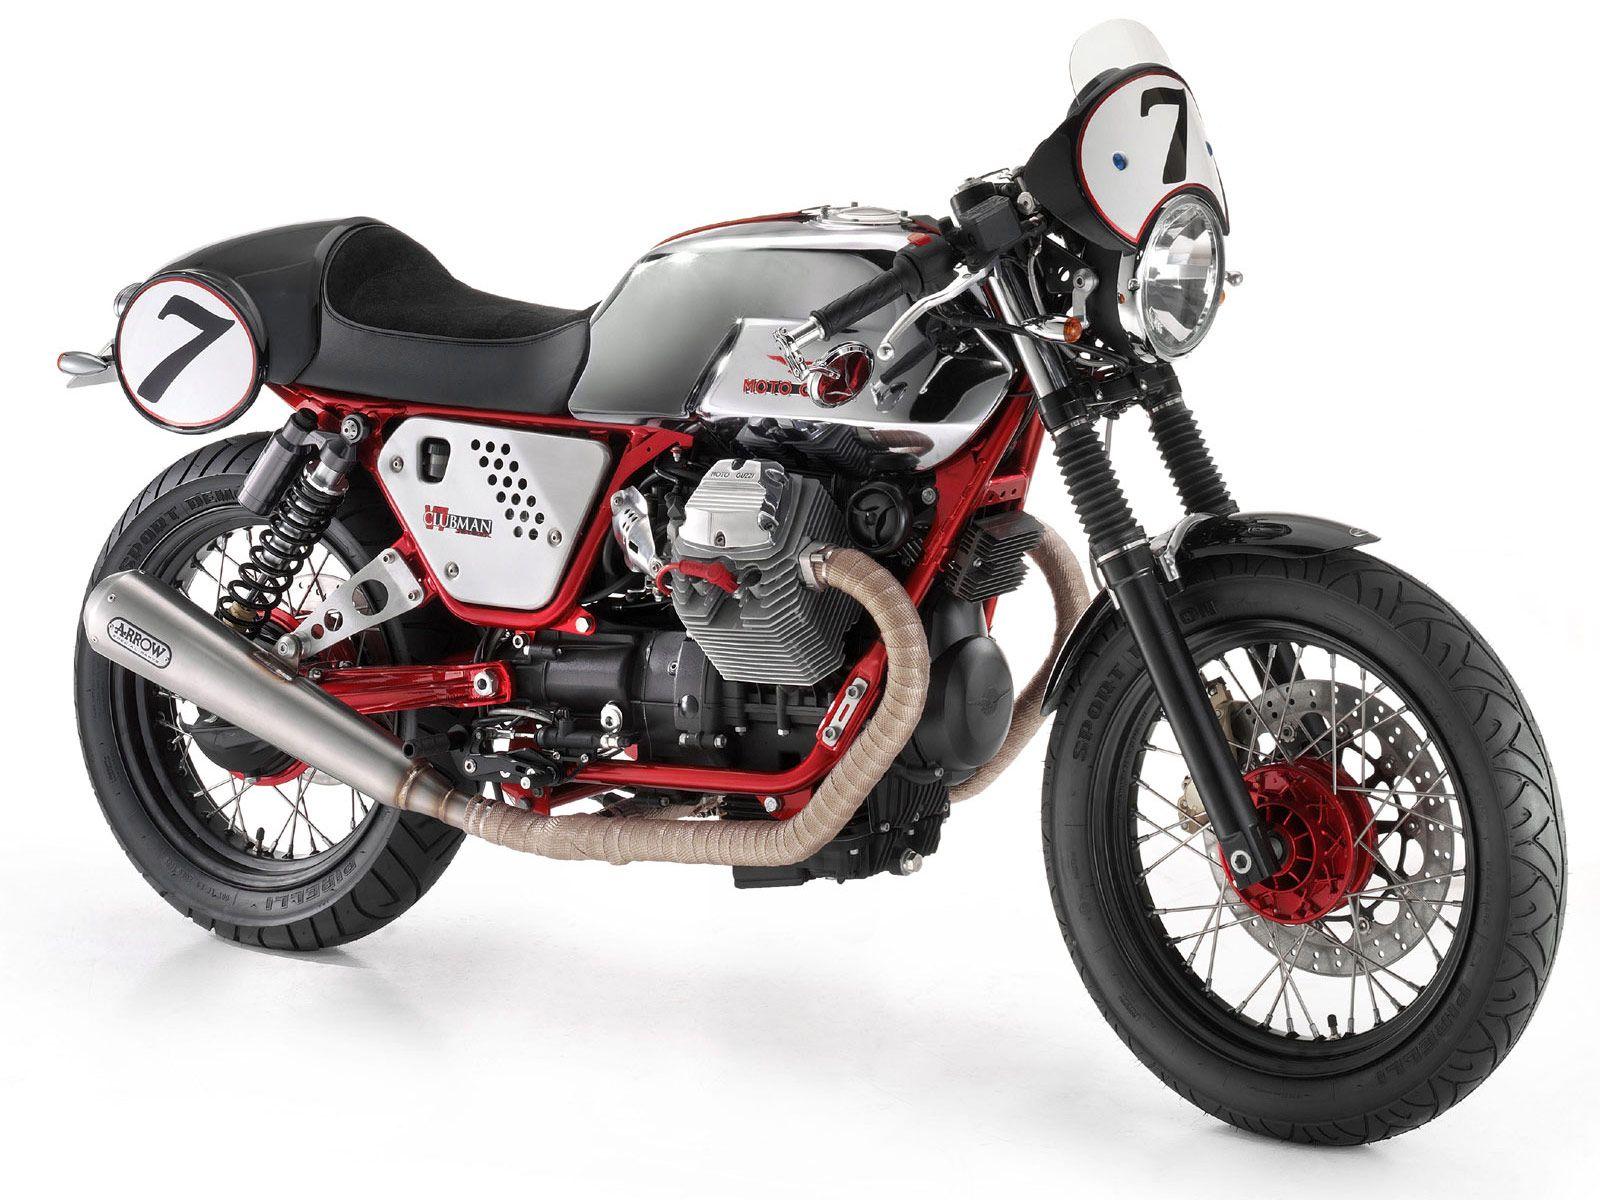 2014 moto guzzi v7 racer review